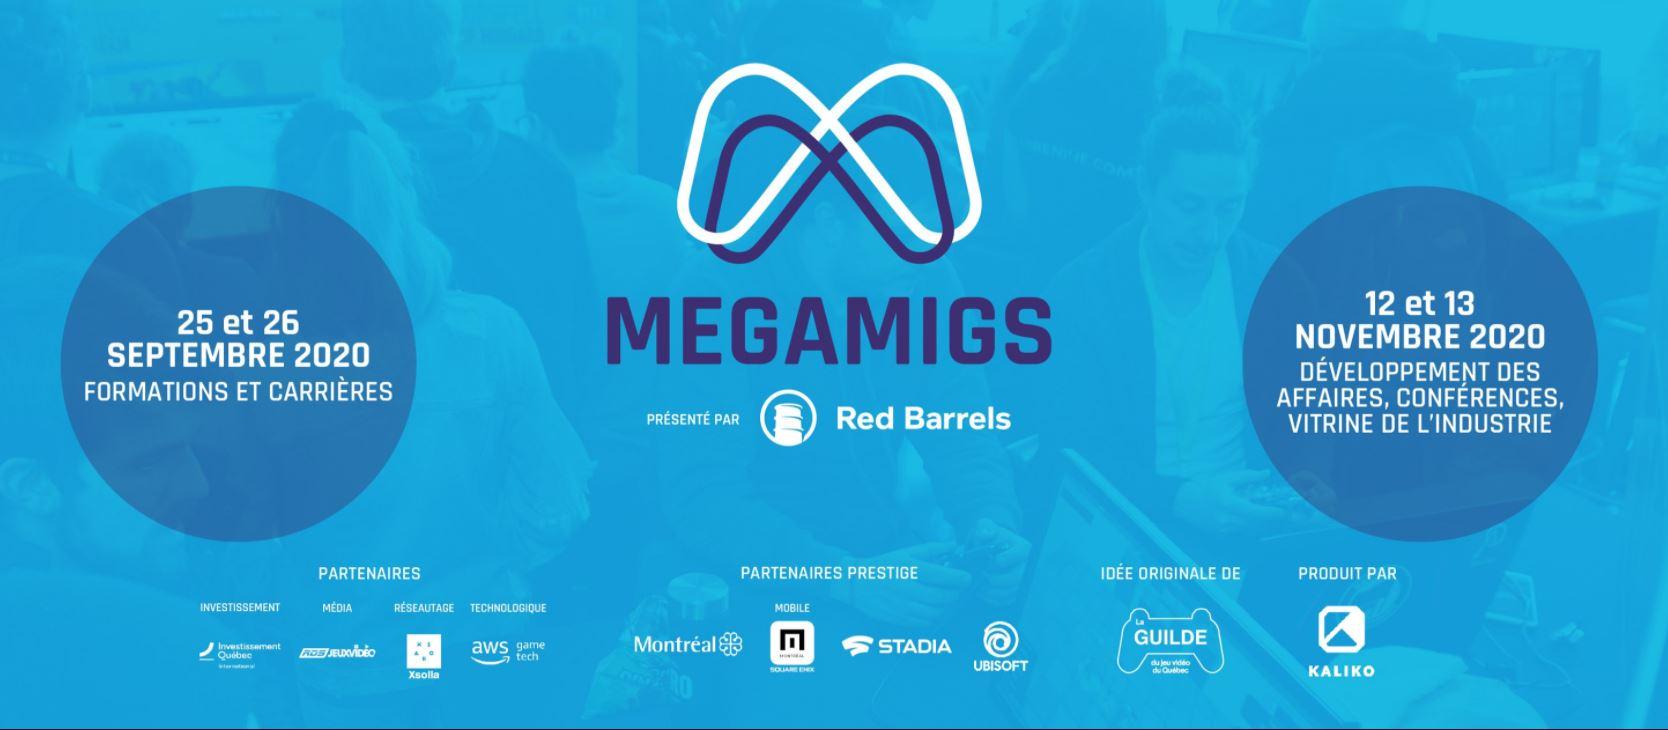 Megamigs 2020